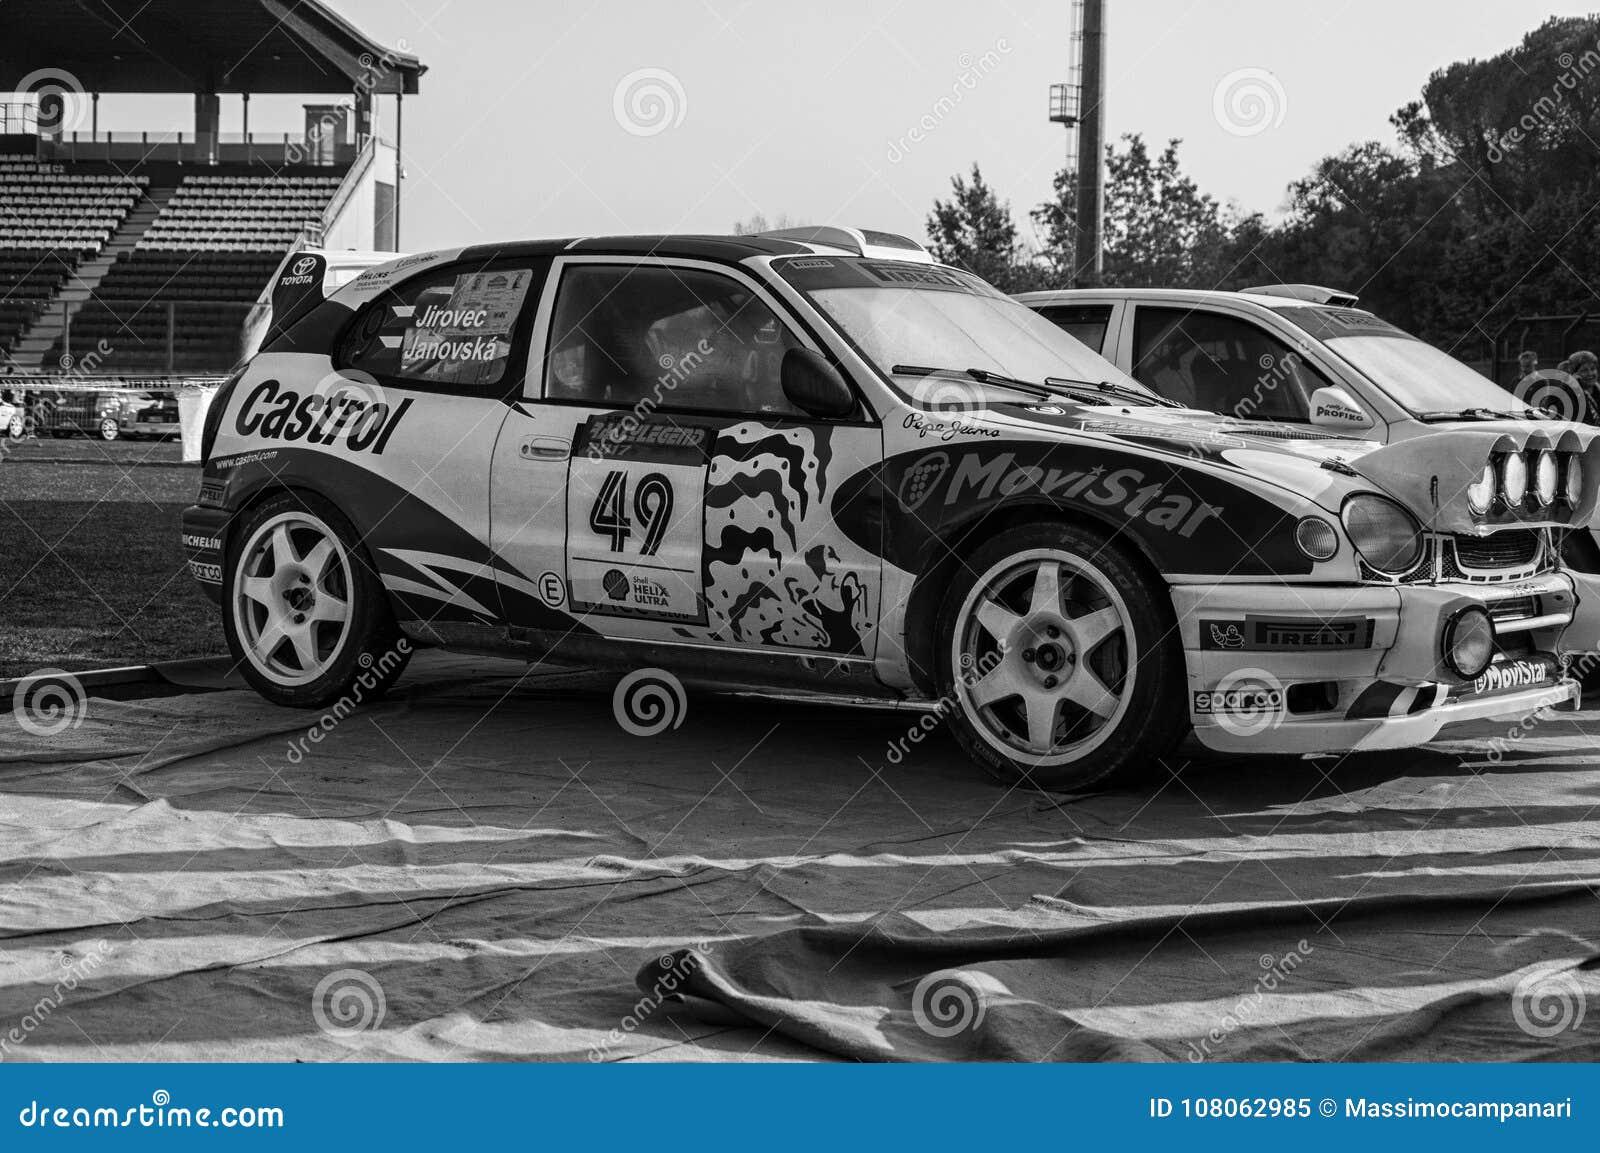 Van nelvecchio van TOYOTA COROLLA WRC 1998 van radunodella van vetturada corsala LEGGENDA 2017